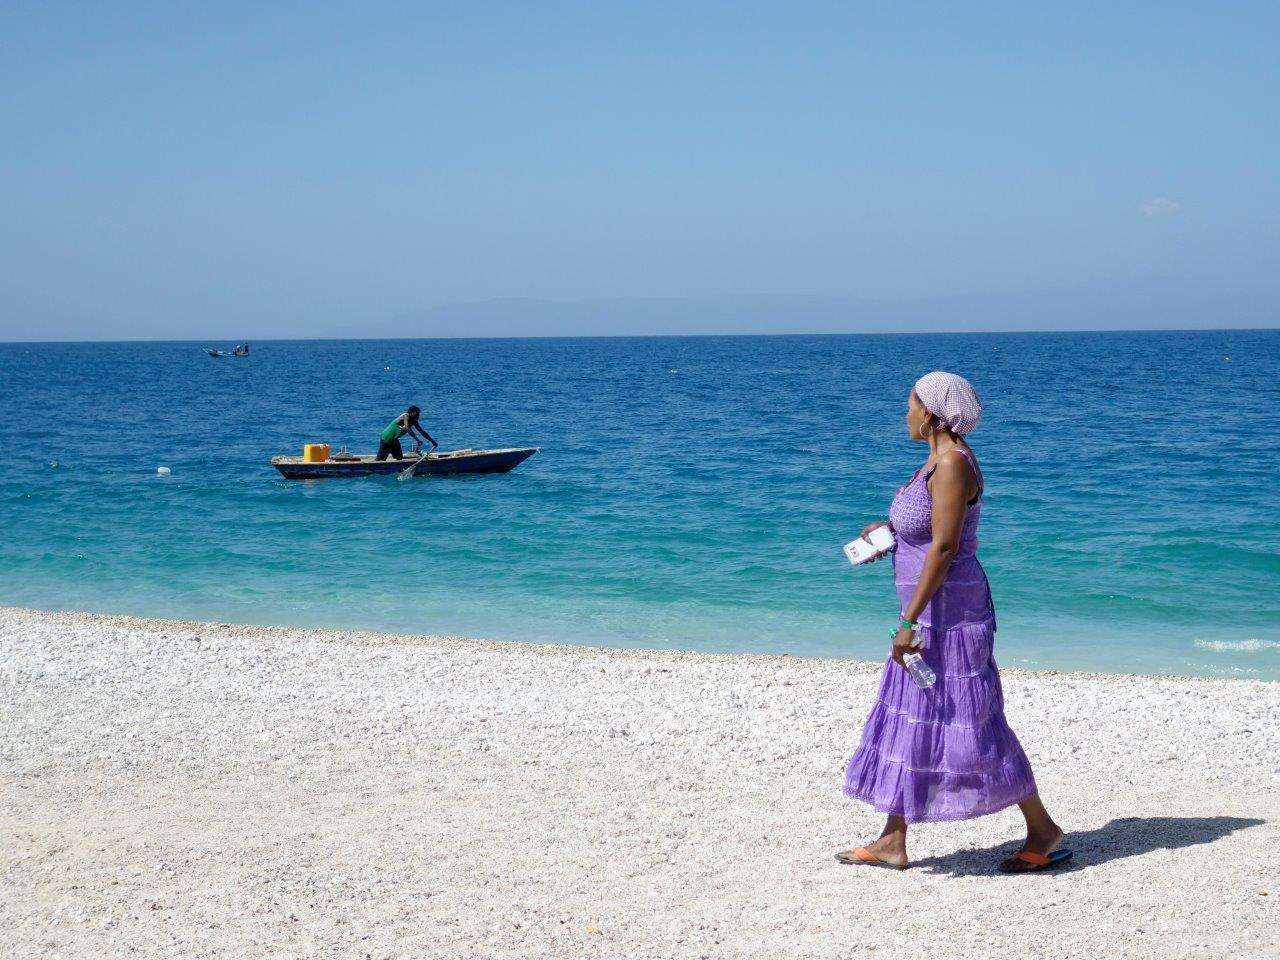 Woman walking on Kaliko Beach with fisherman in background